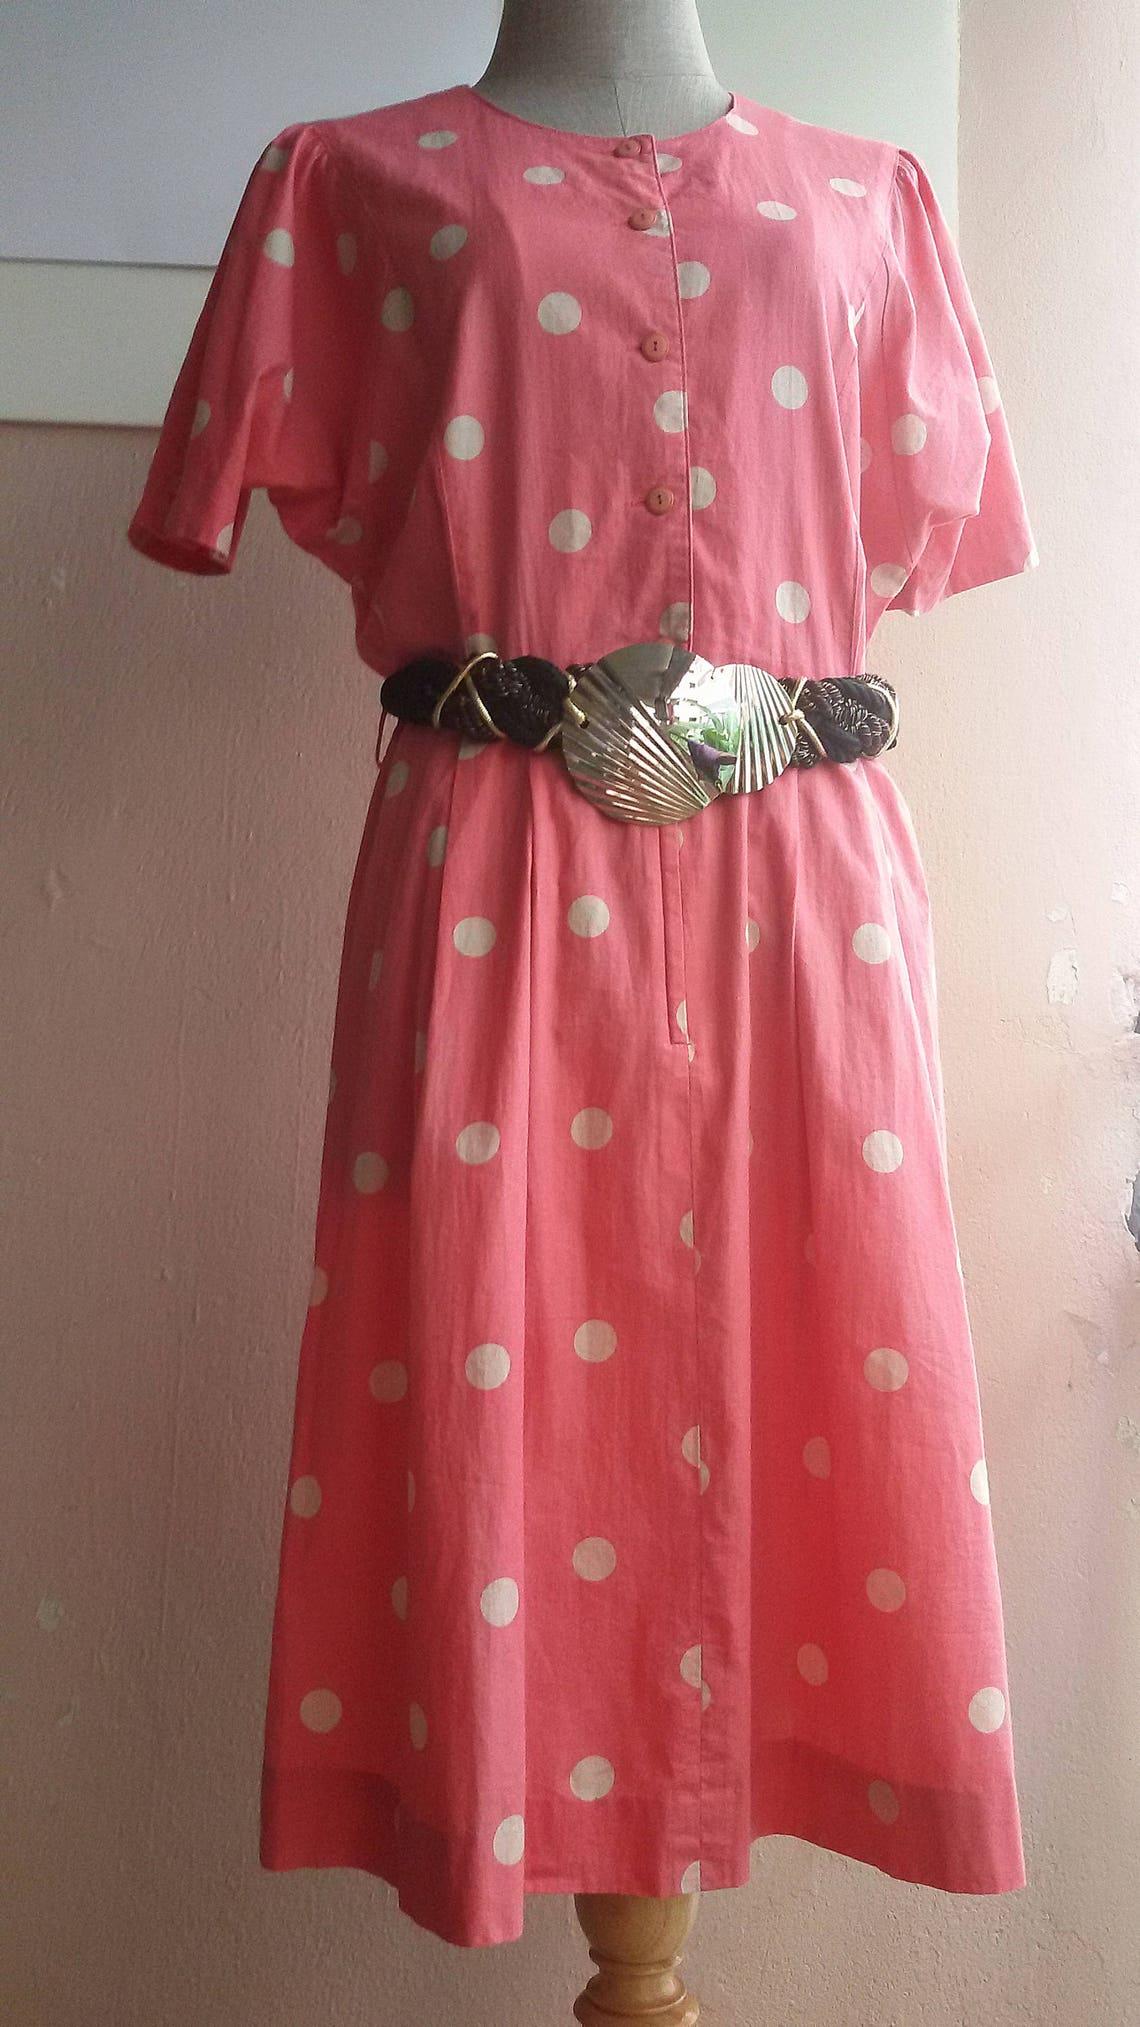 M  70s Day Dress  Summer Cotton Polka Dot Dress  Pink Cream